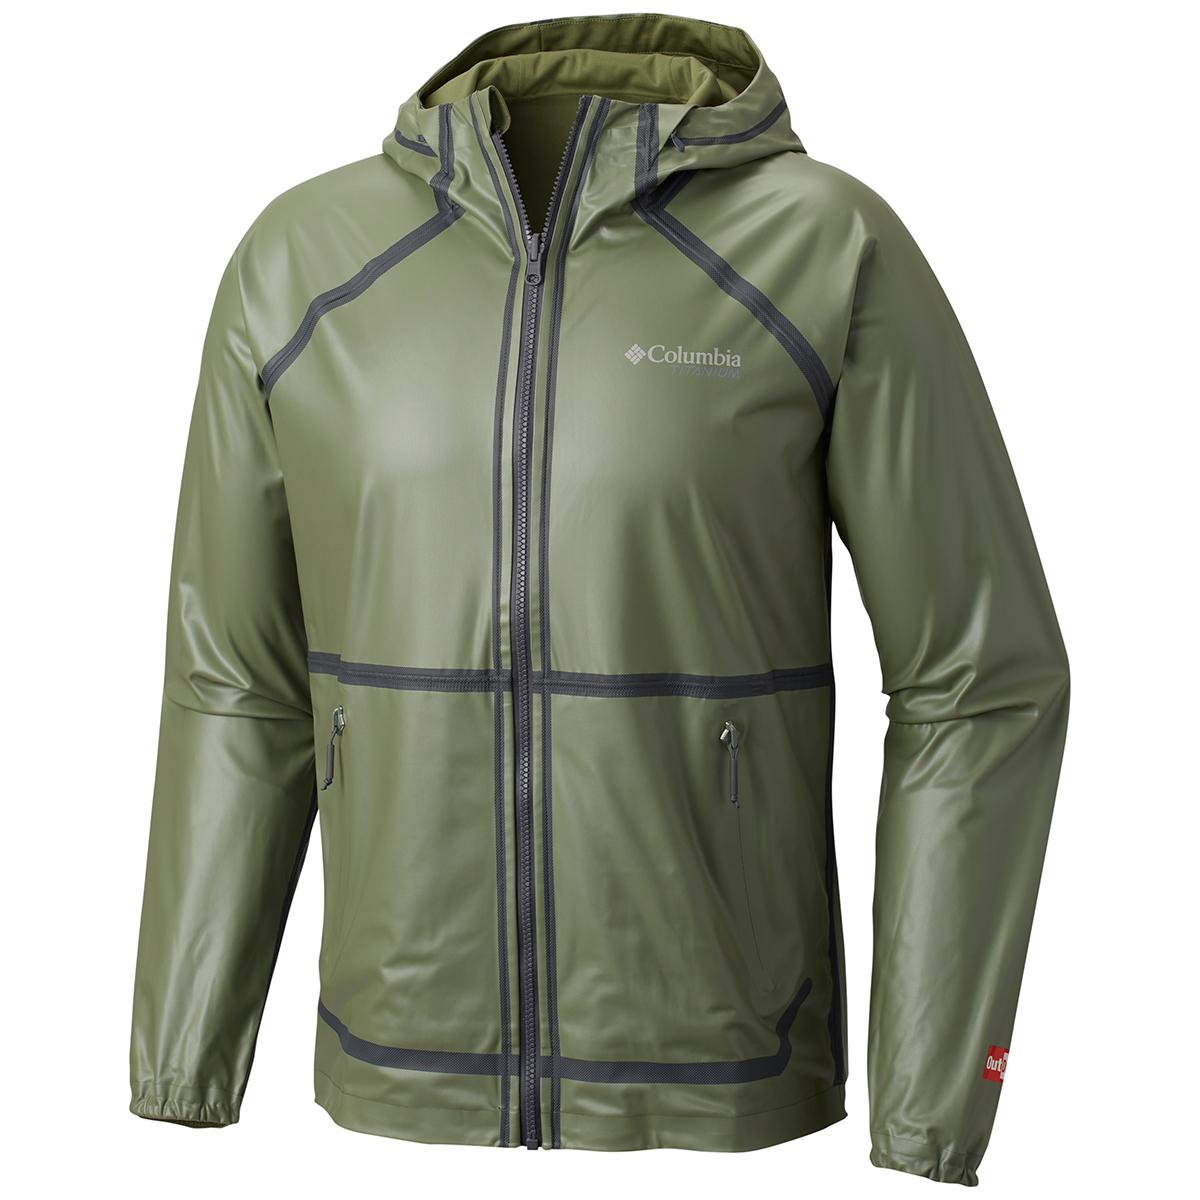 Columbia Men's Outdry Ex Reversible Jacket - Black, S